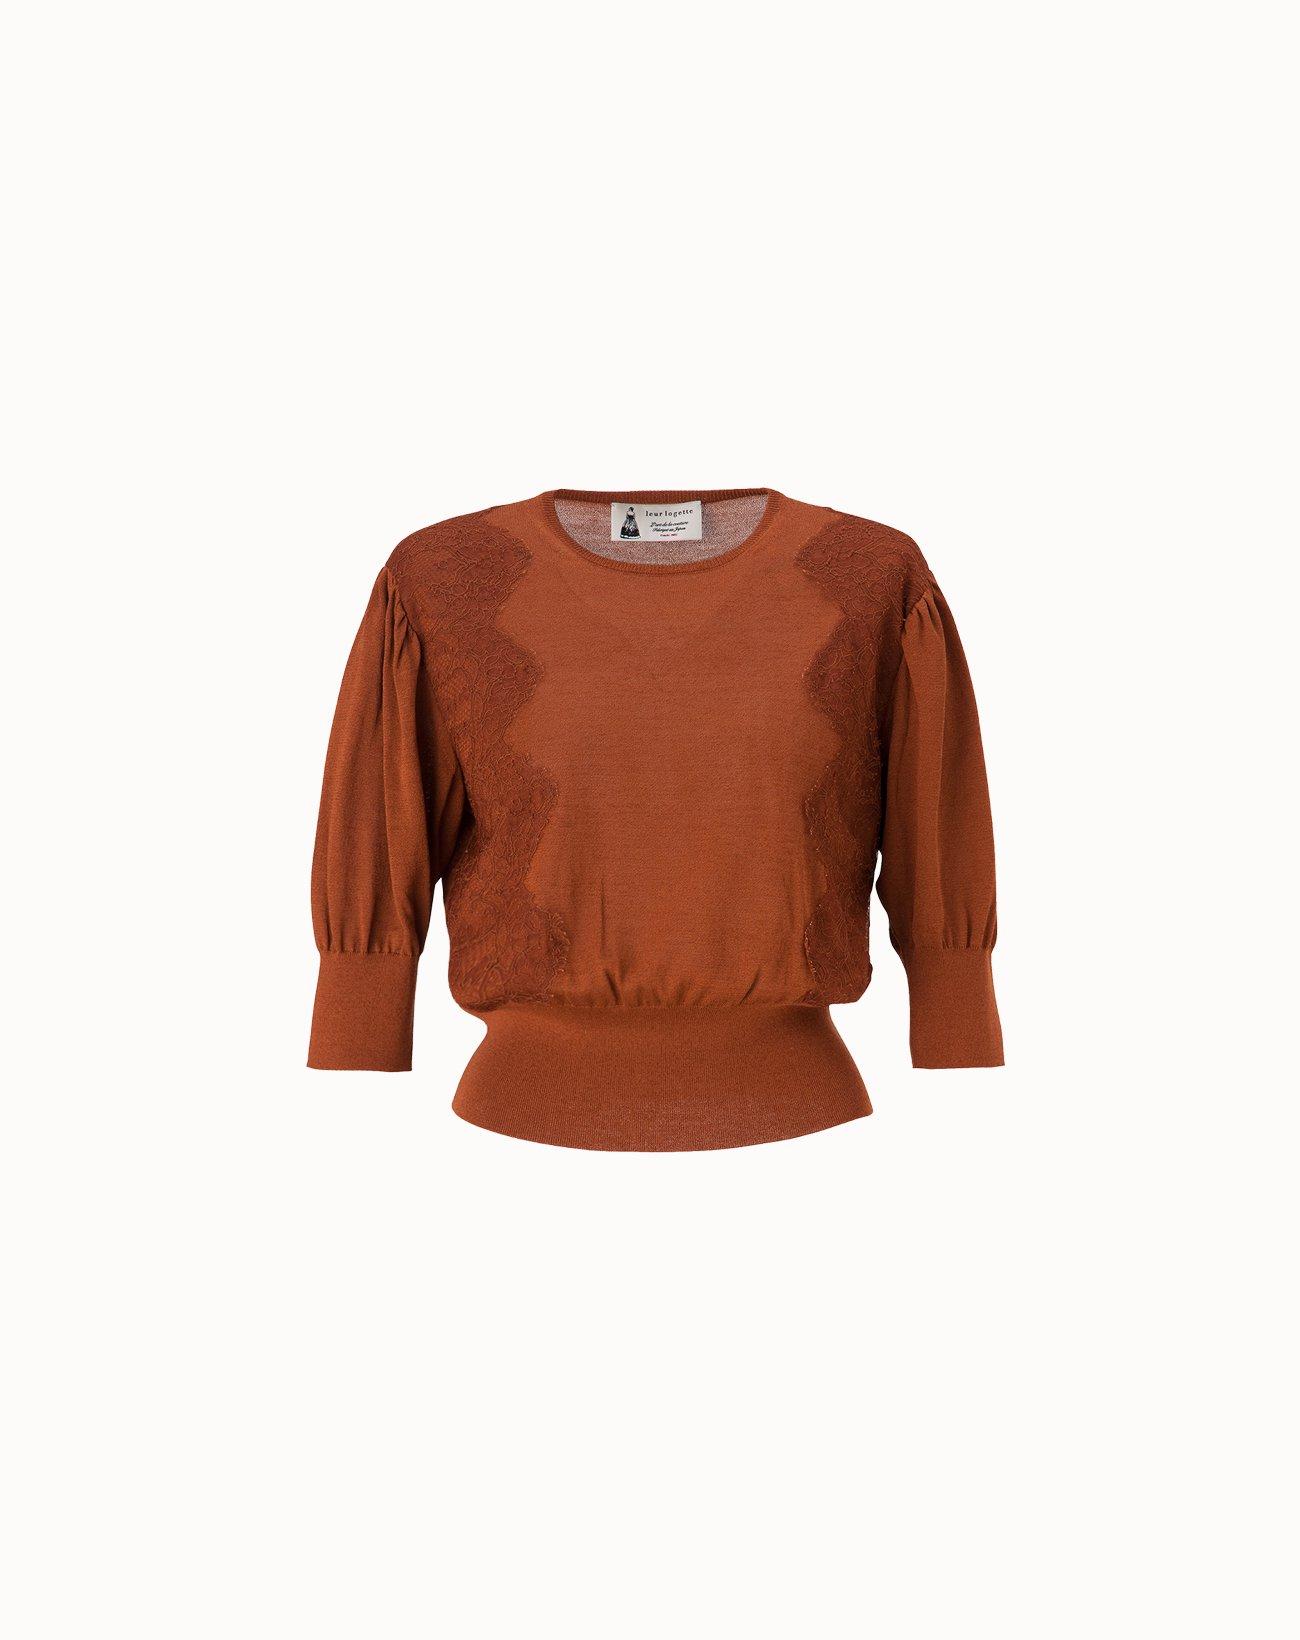 leur logette - Cotton Silk Top - Brown